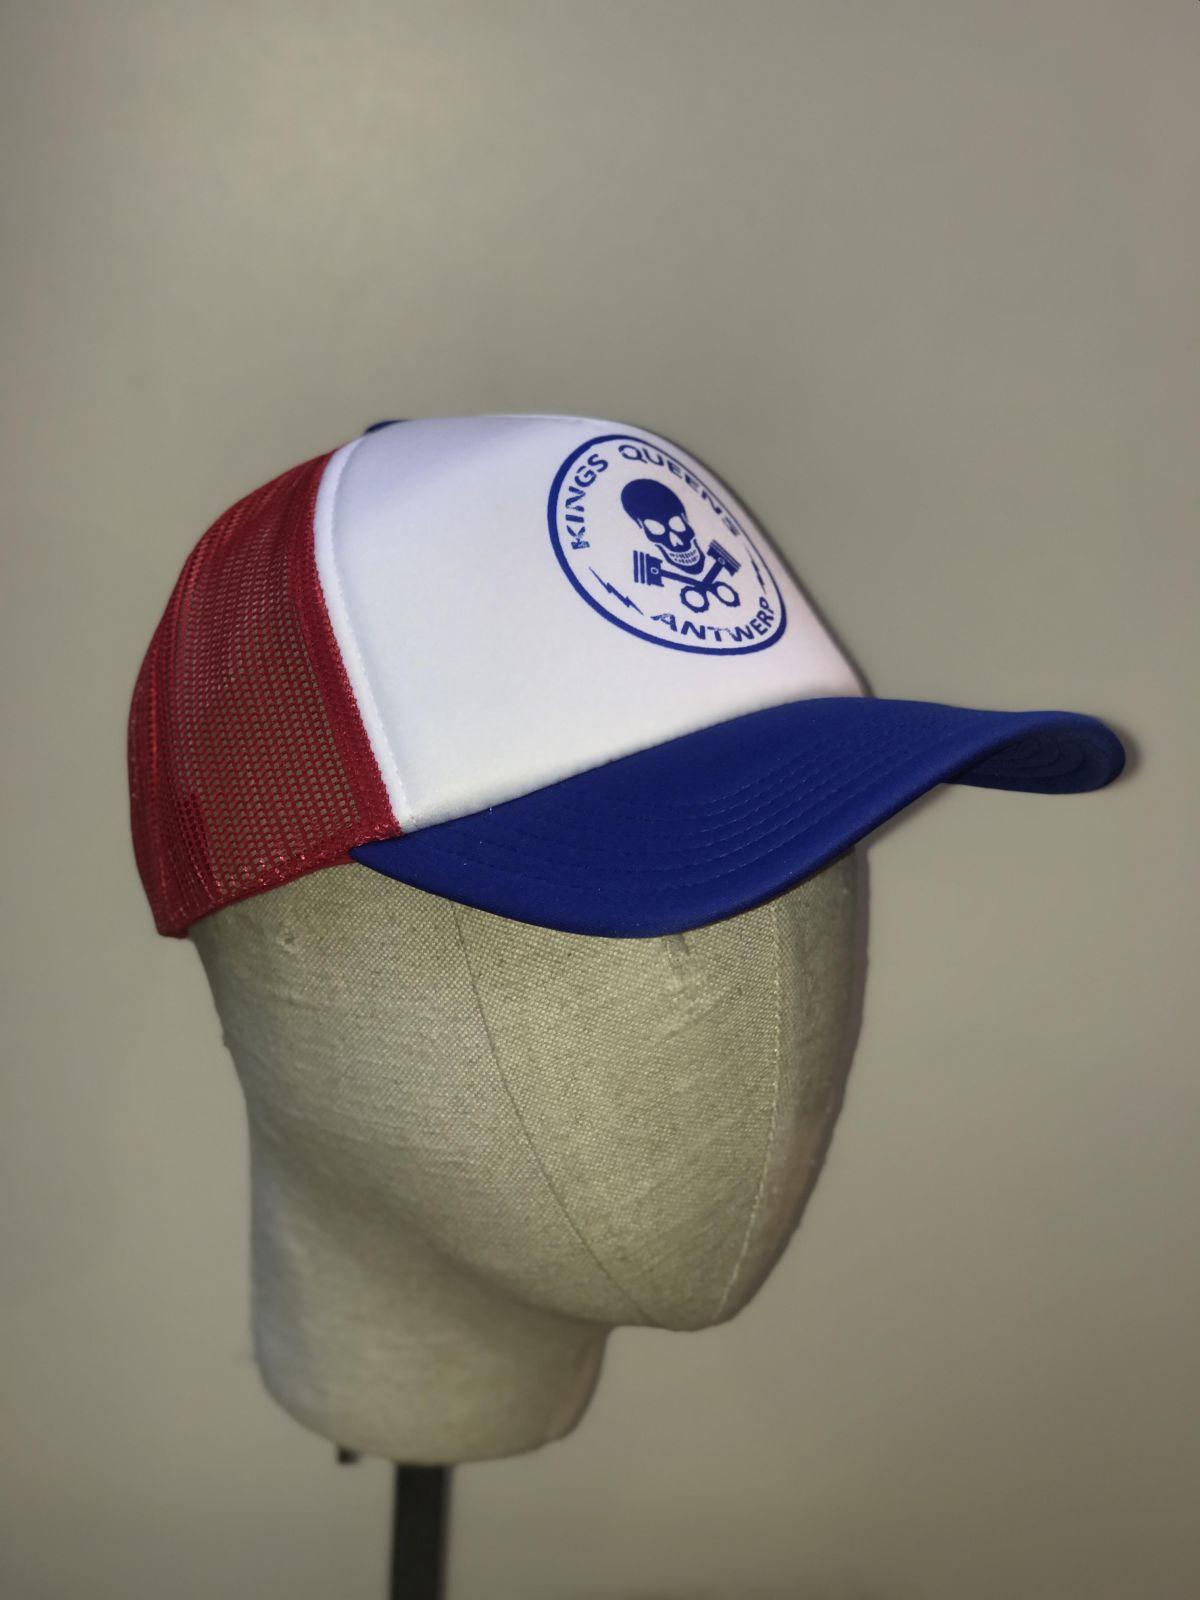 Kings & Queens Skull Logo Cap Blue/Red/White - Kings & Queens